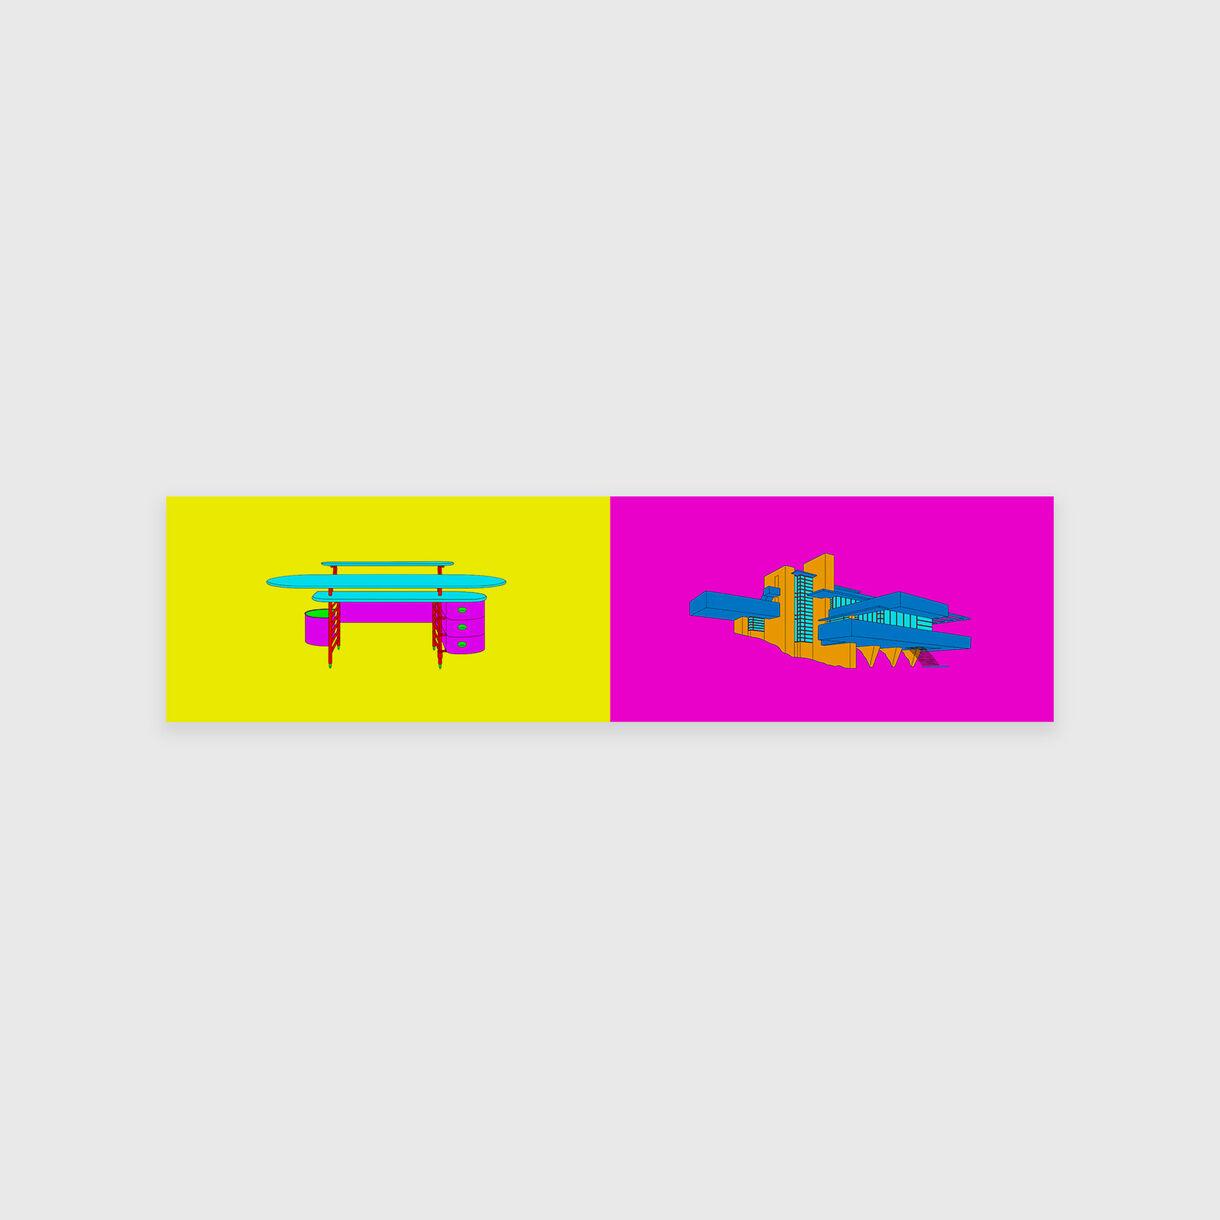 Design and Architecture – Frank Lloyd Wright, Michael Craig-Martin